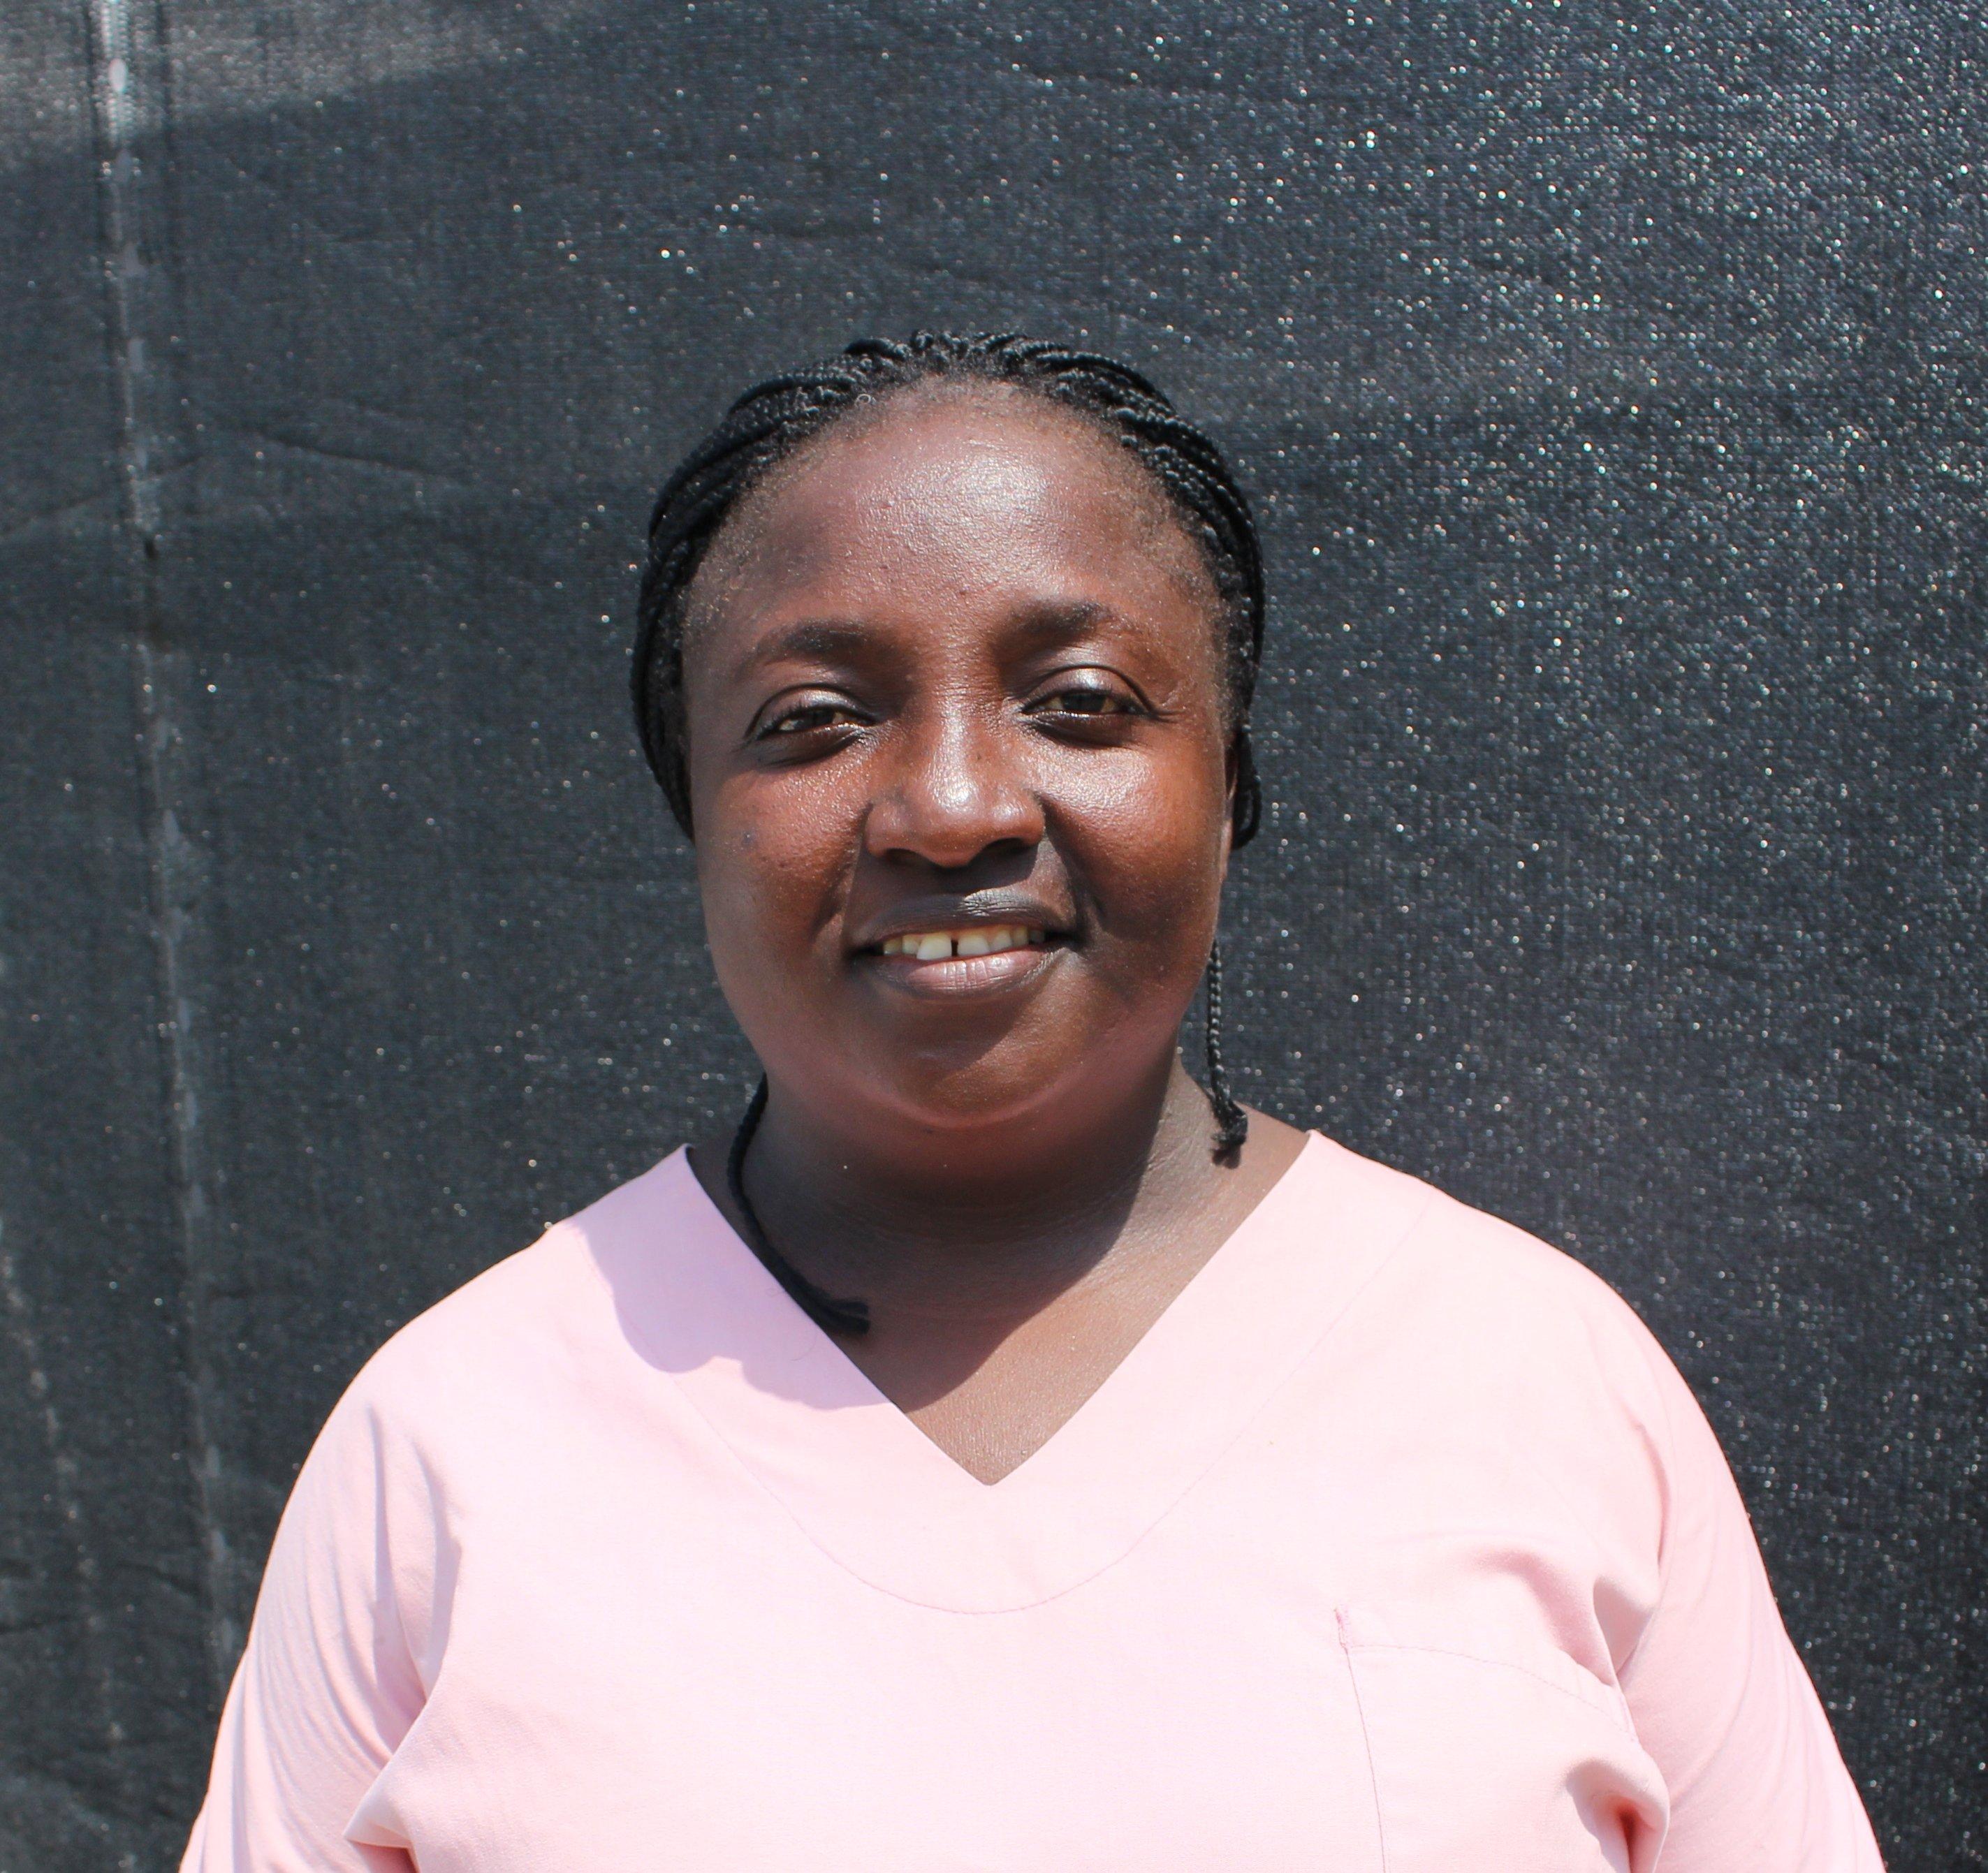 Amie Subah is an Ebola survivor from Monrovia, Liberia